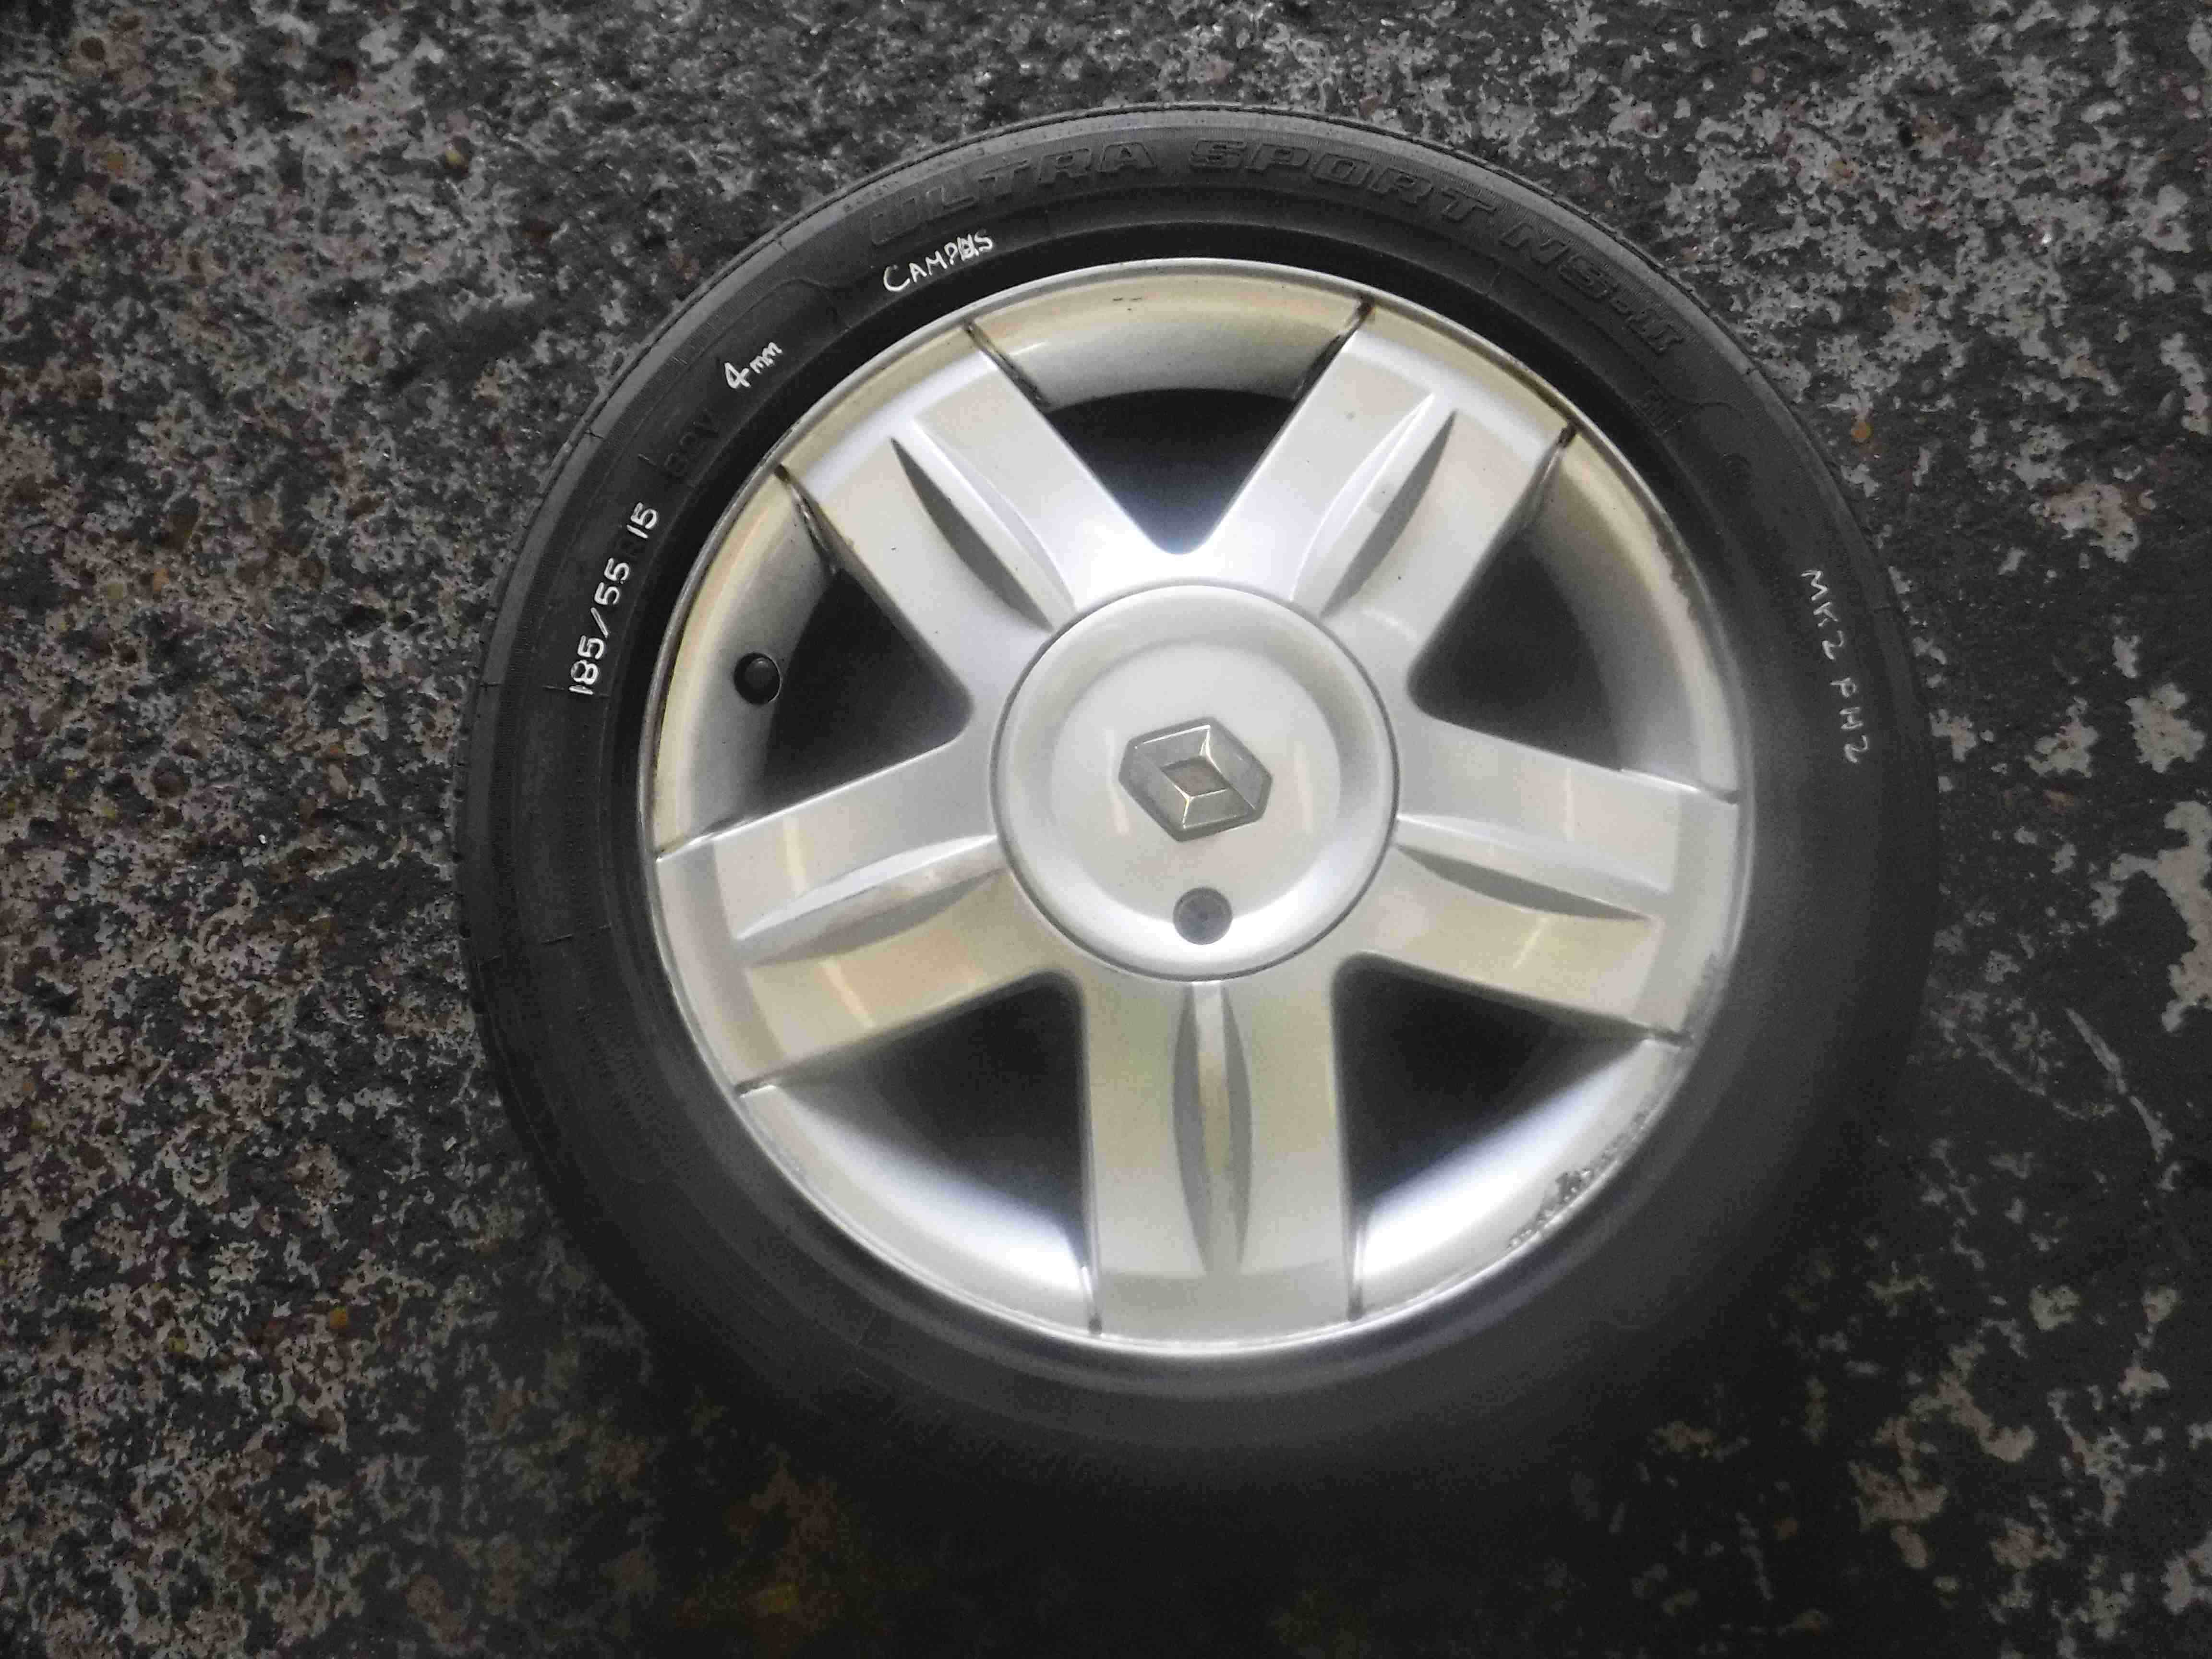 Renault Clio MK2 2001-2006 Alium Campus Alloy Wheel 3/5 Needs New Tyre